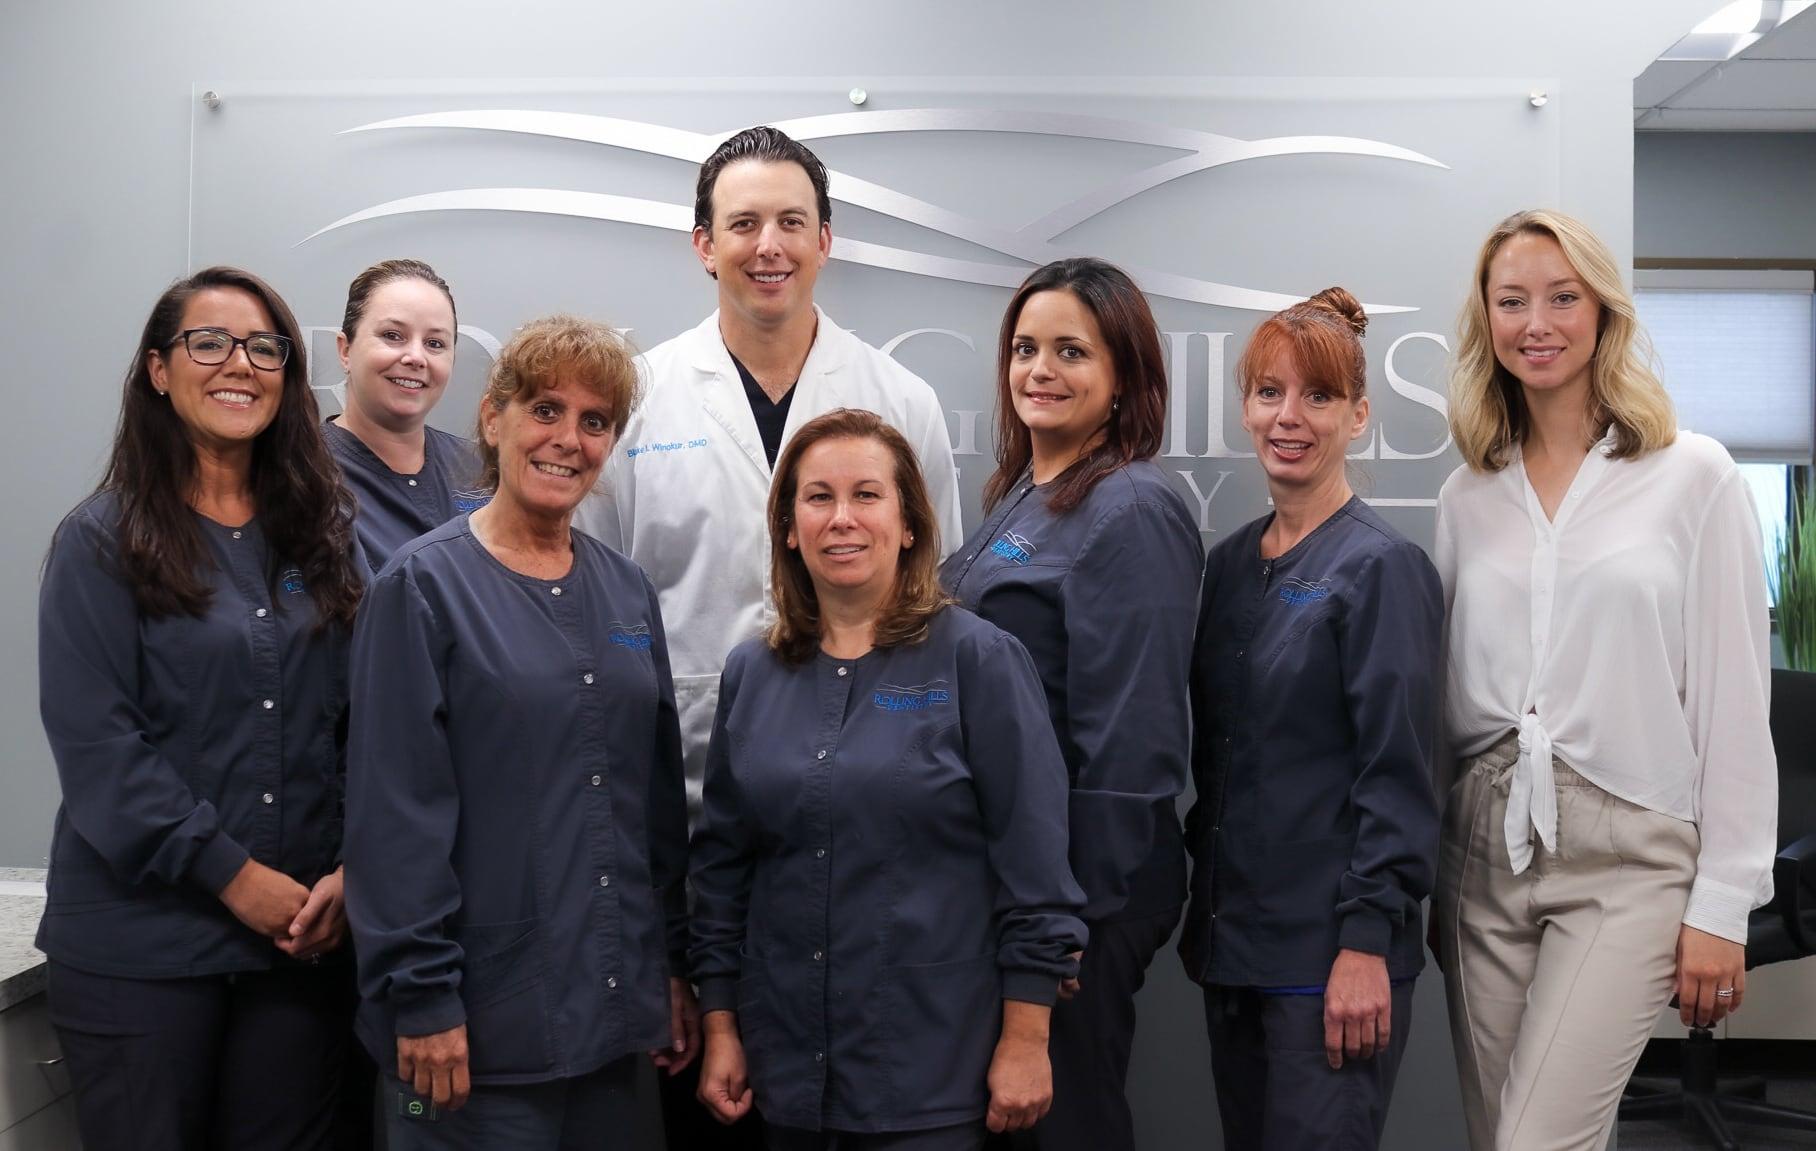 rolling hills dentistry team